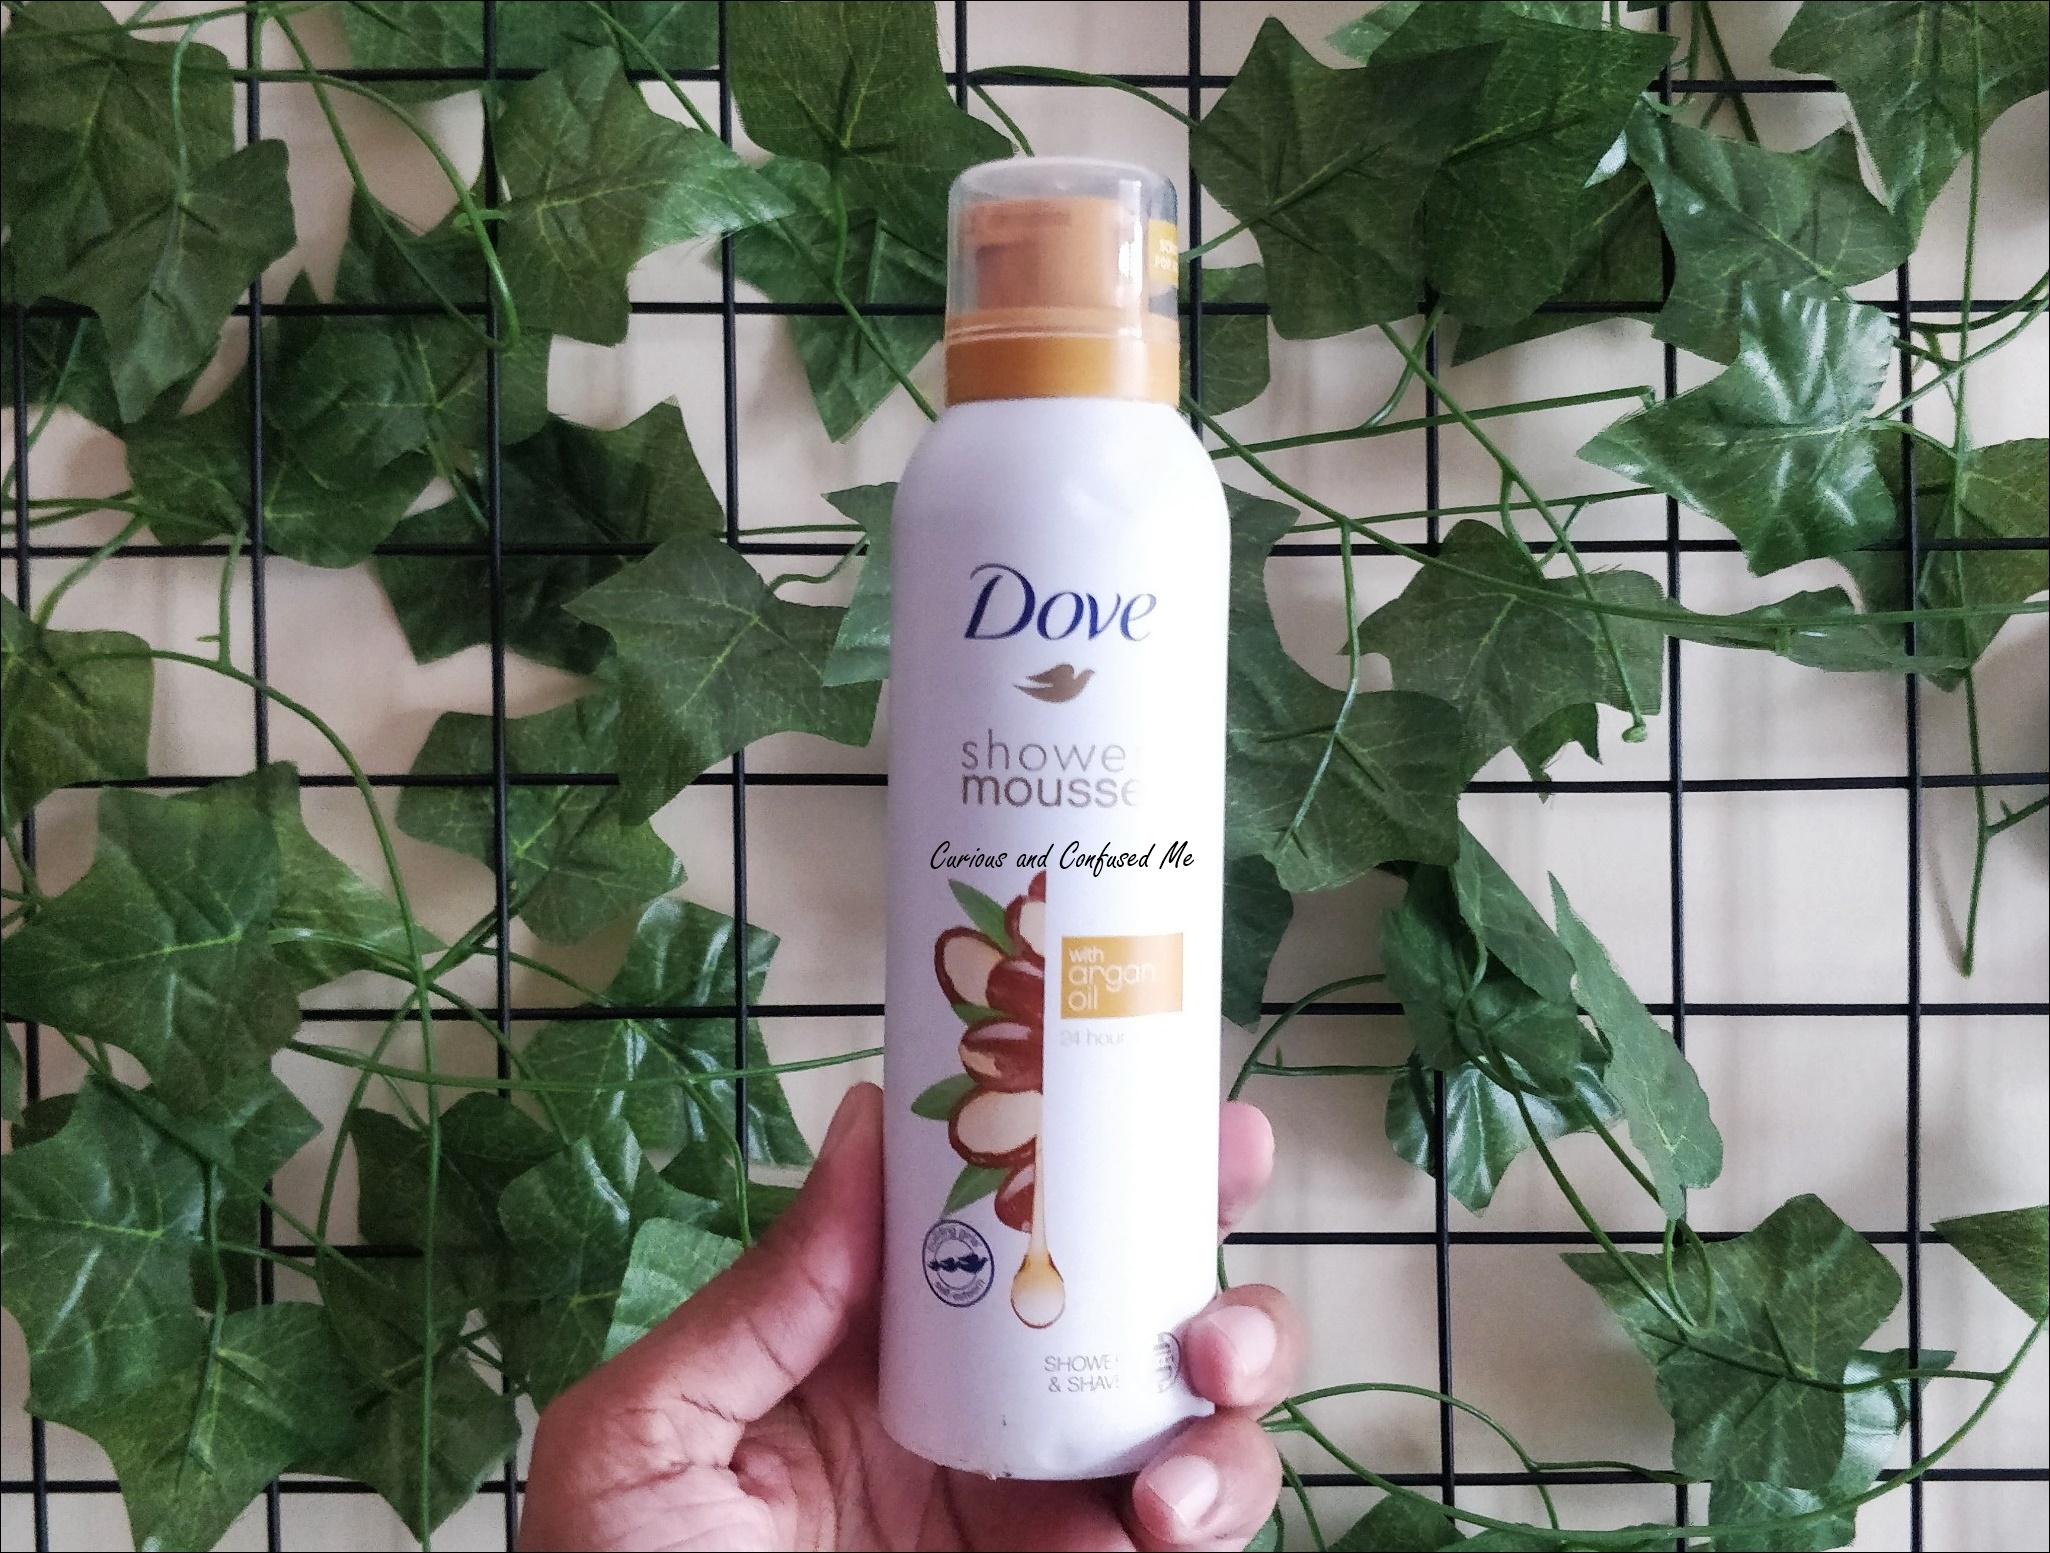 Dove Shower Mousse with Argan Oil